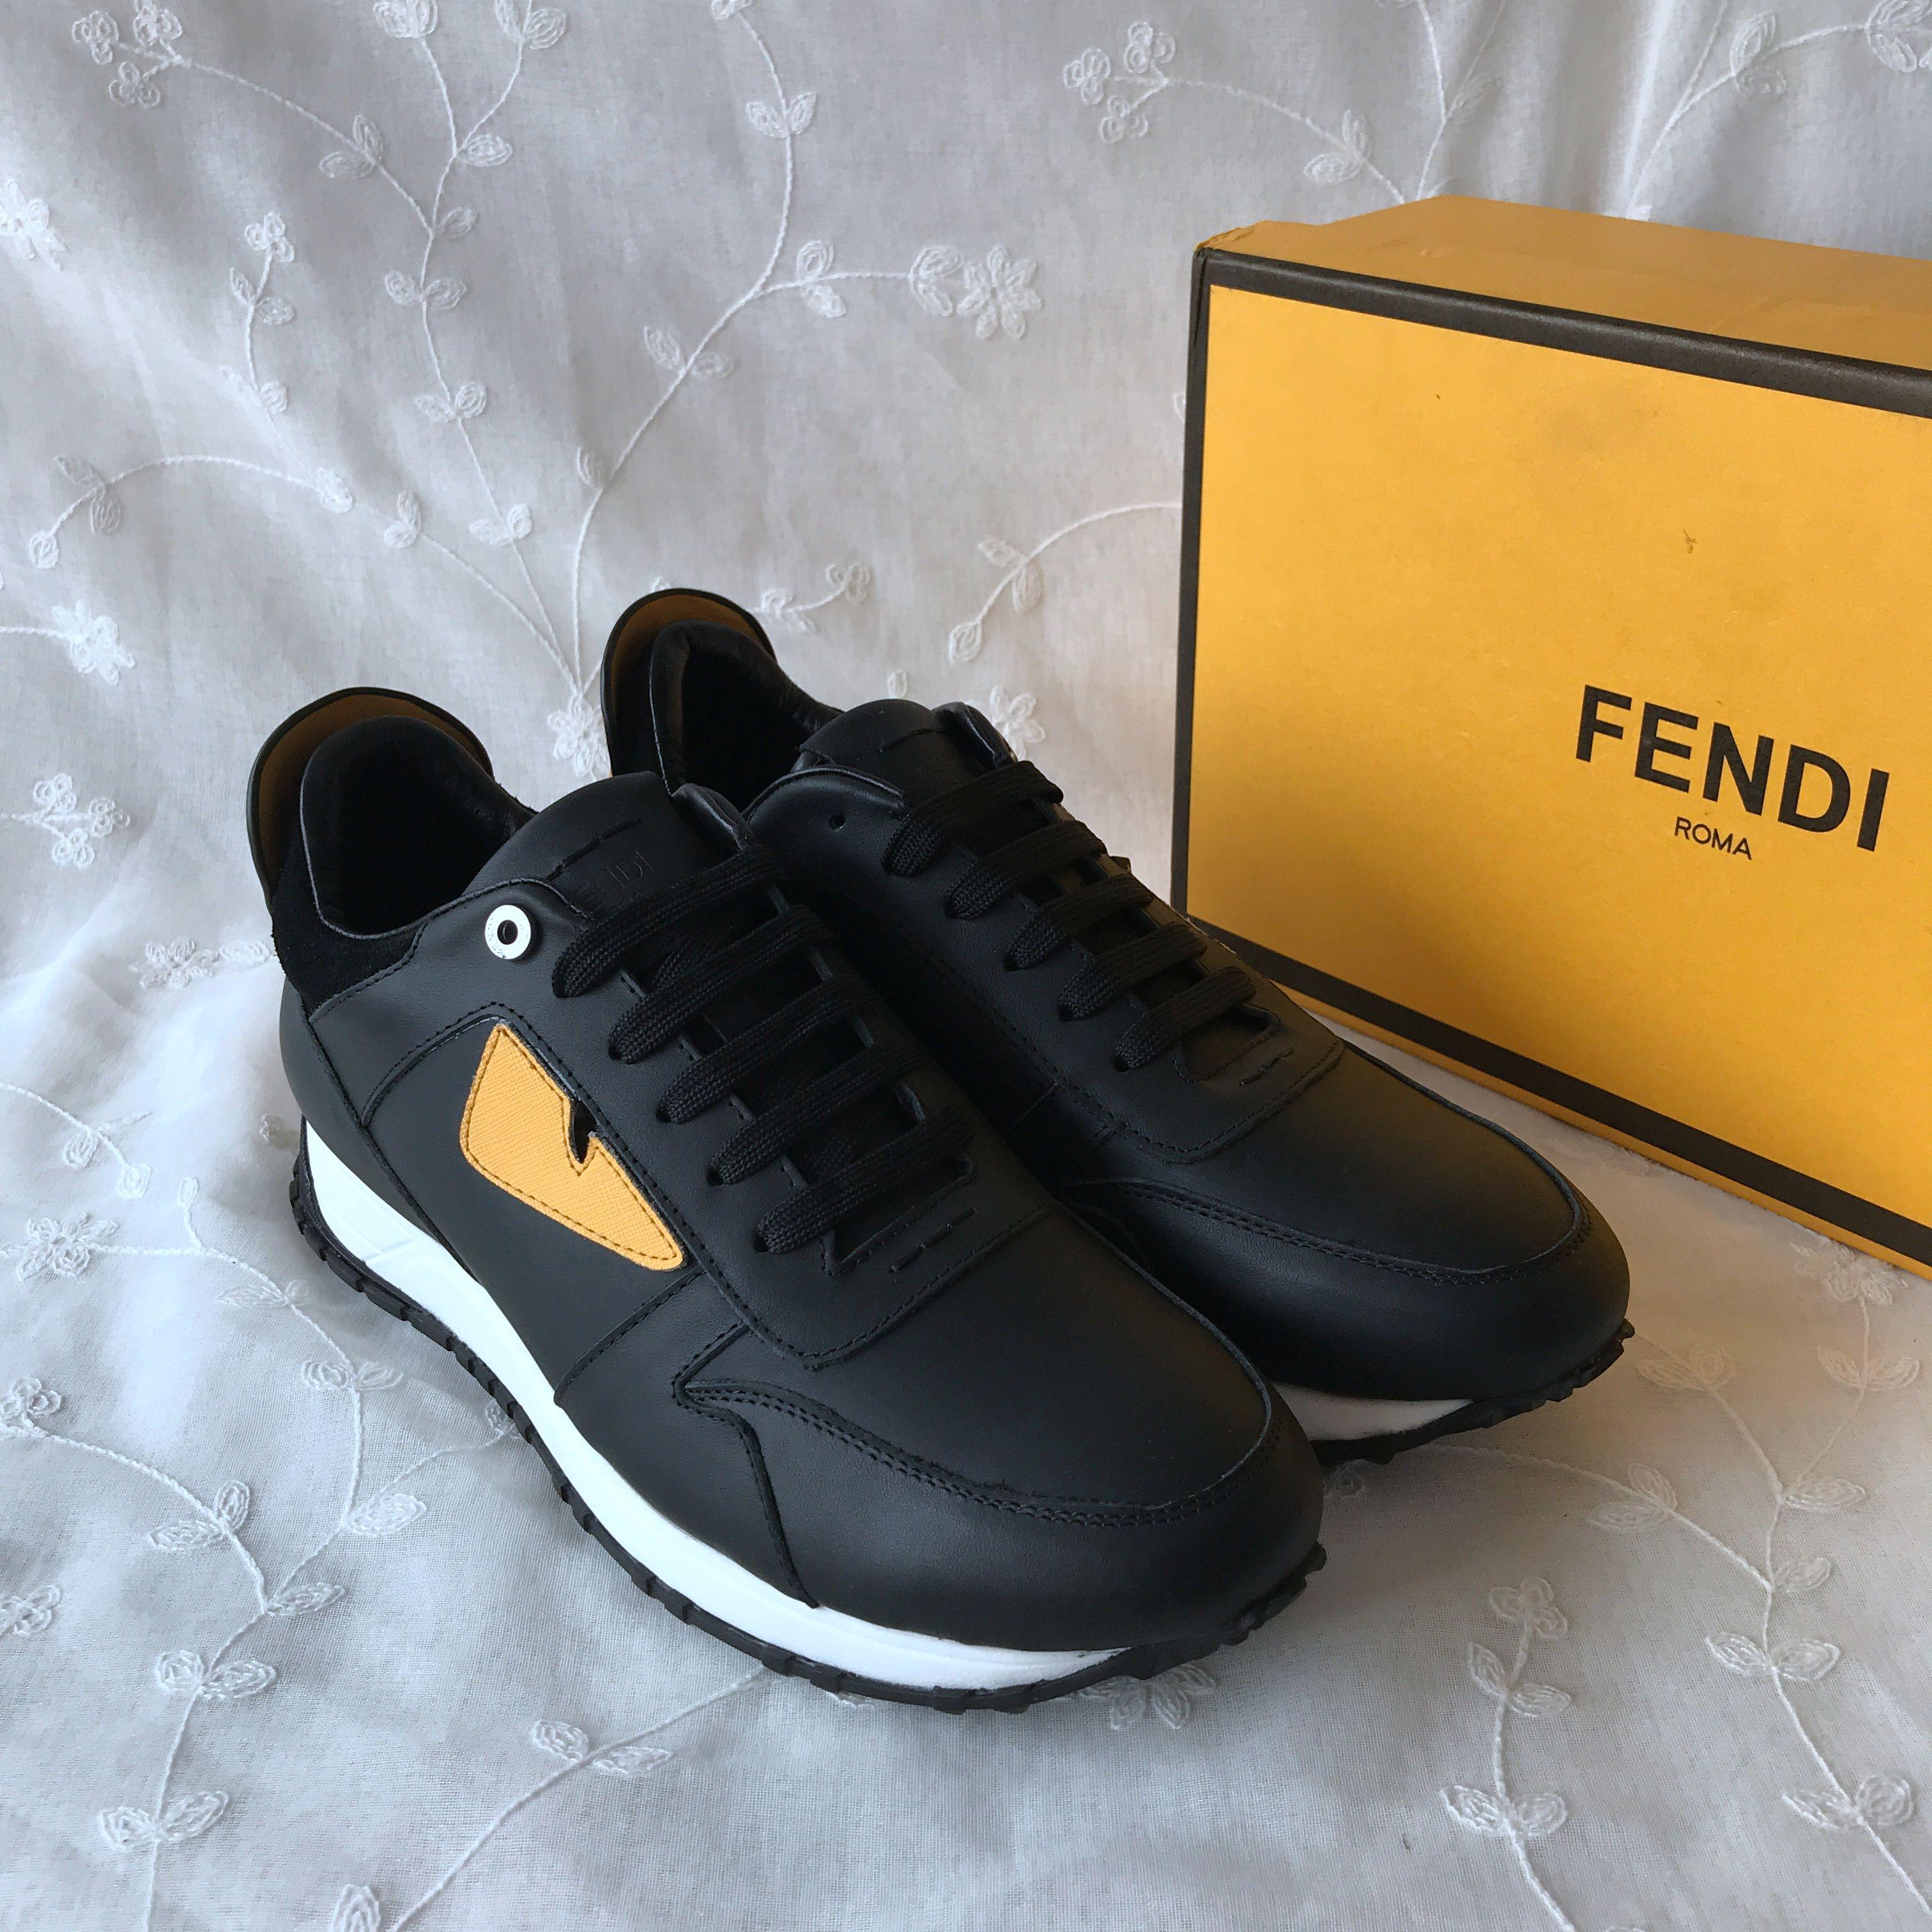 Fendi Casual Shoes 832485